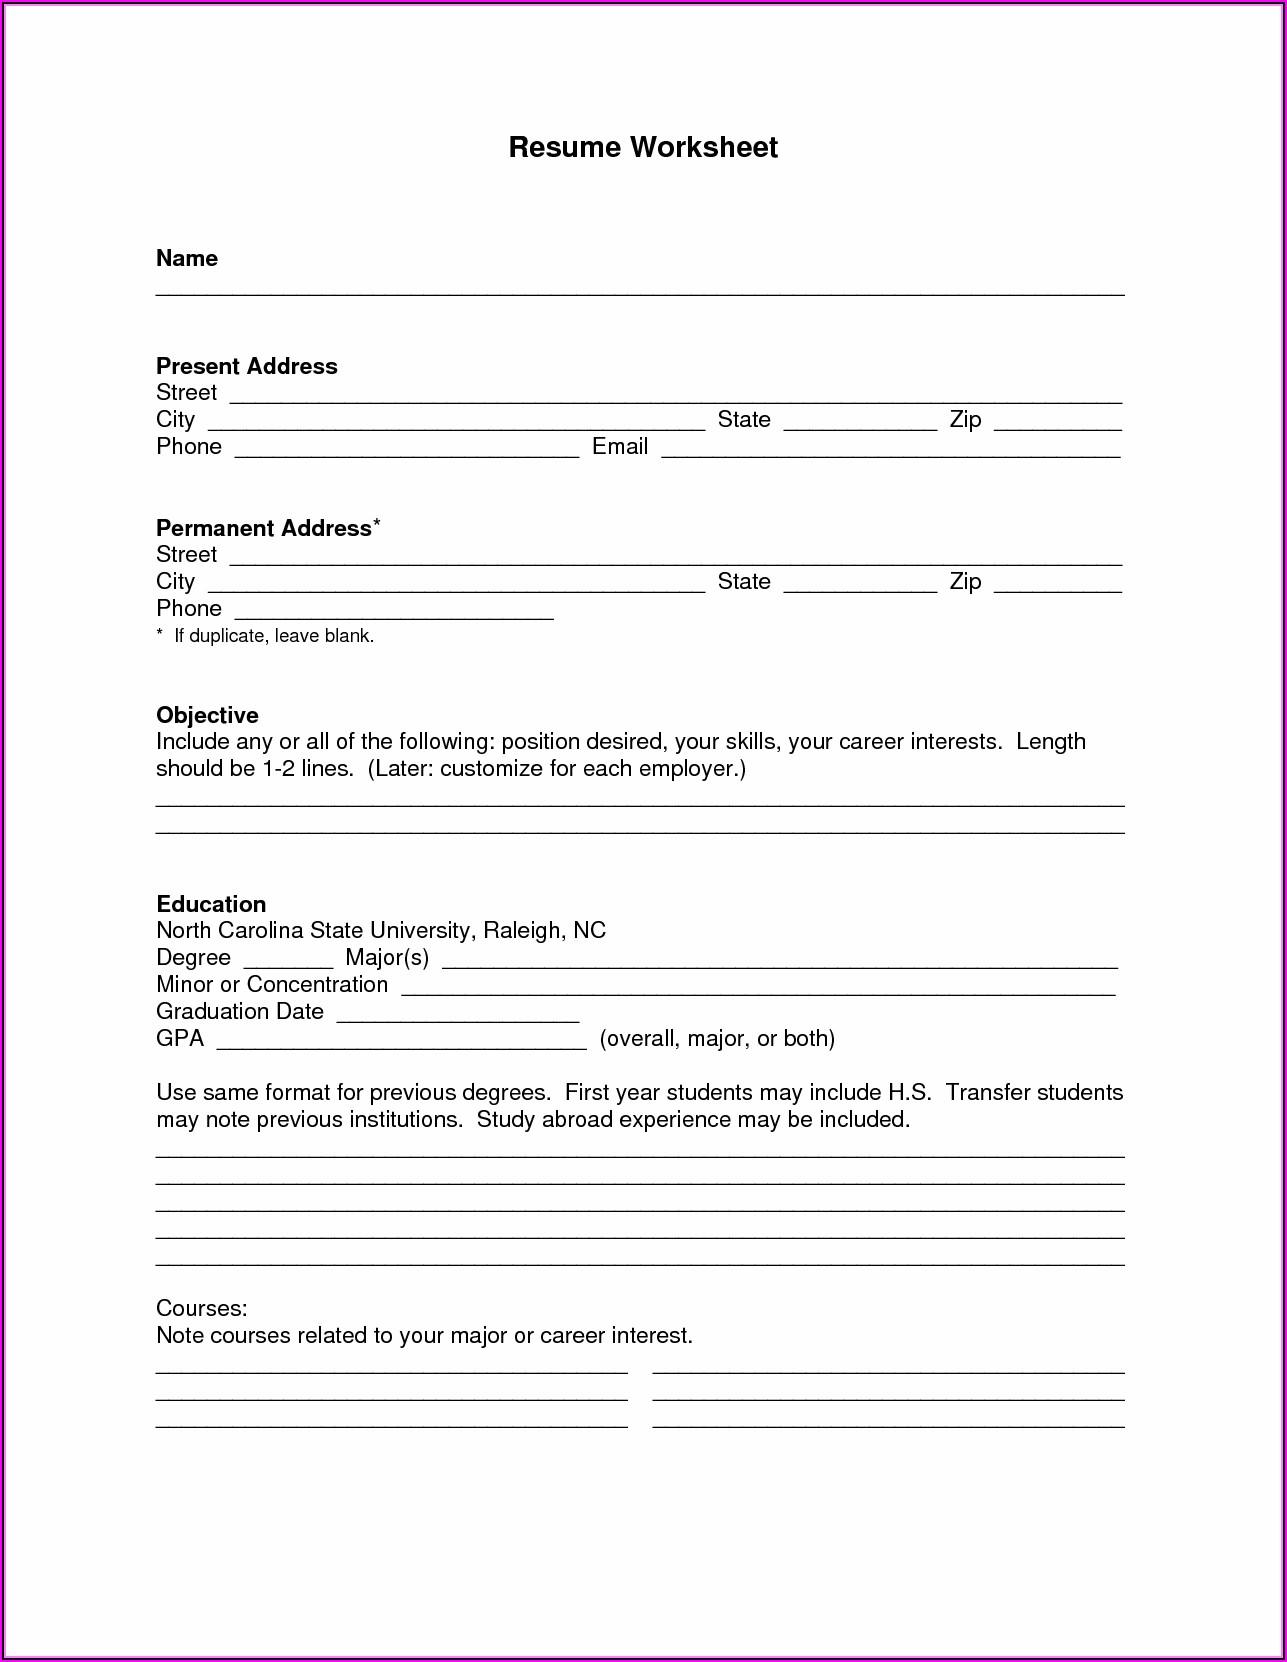 Printable Blank Resume Pdf